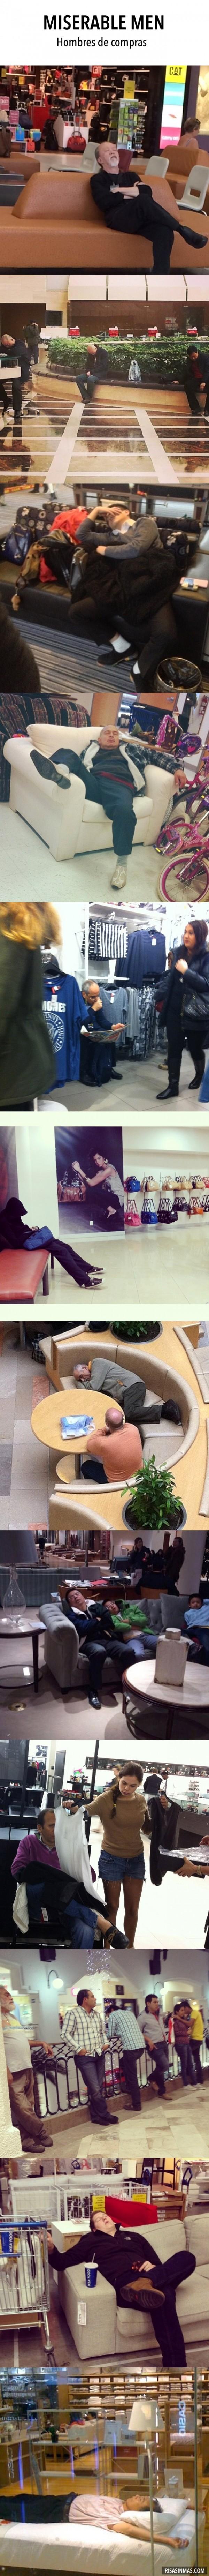 Miserable Men, hombres de compras